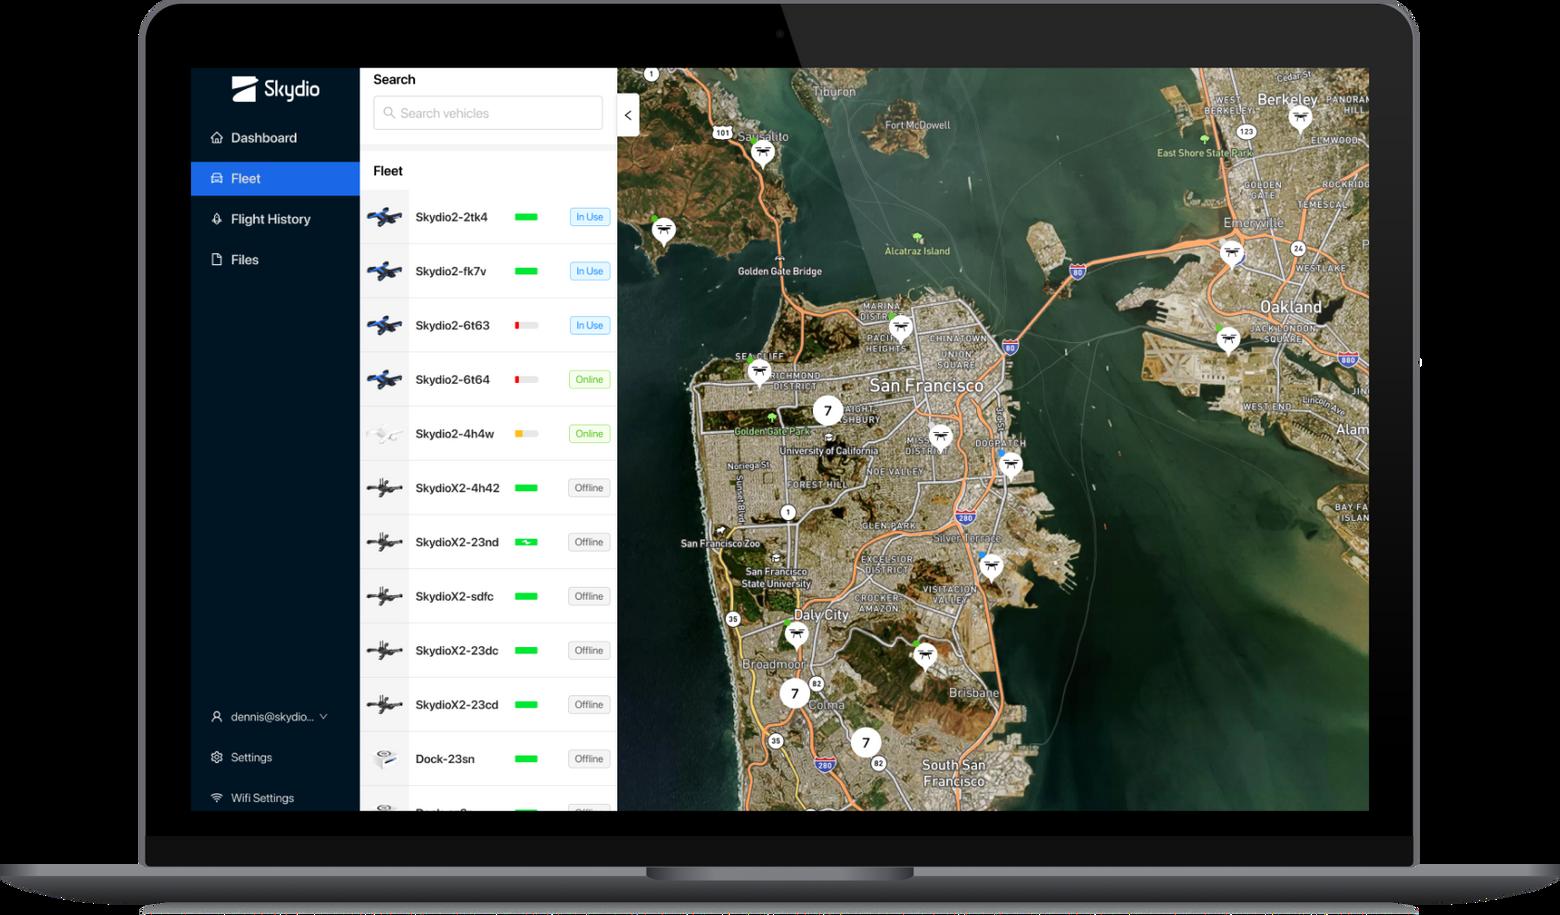 Skydio cloud interface